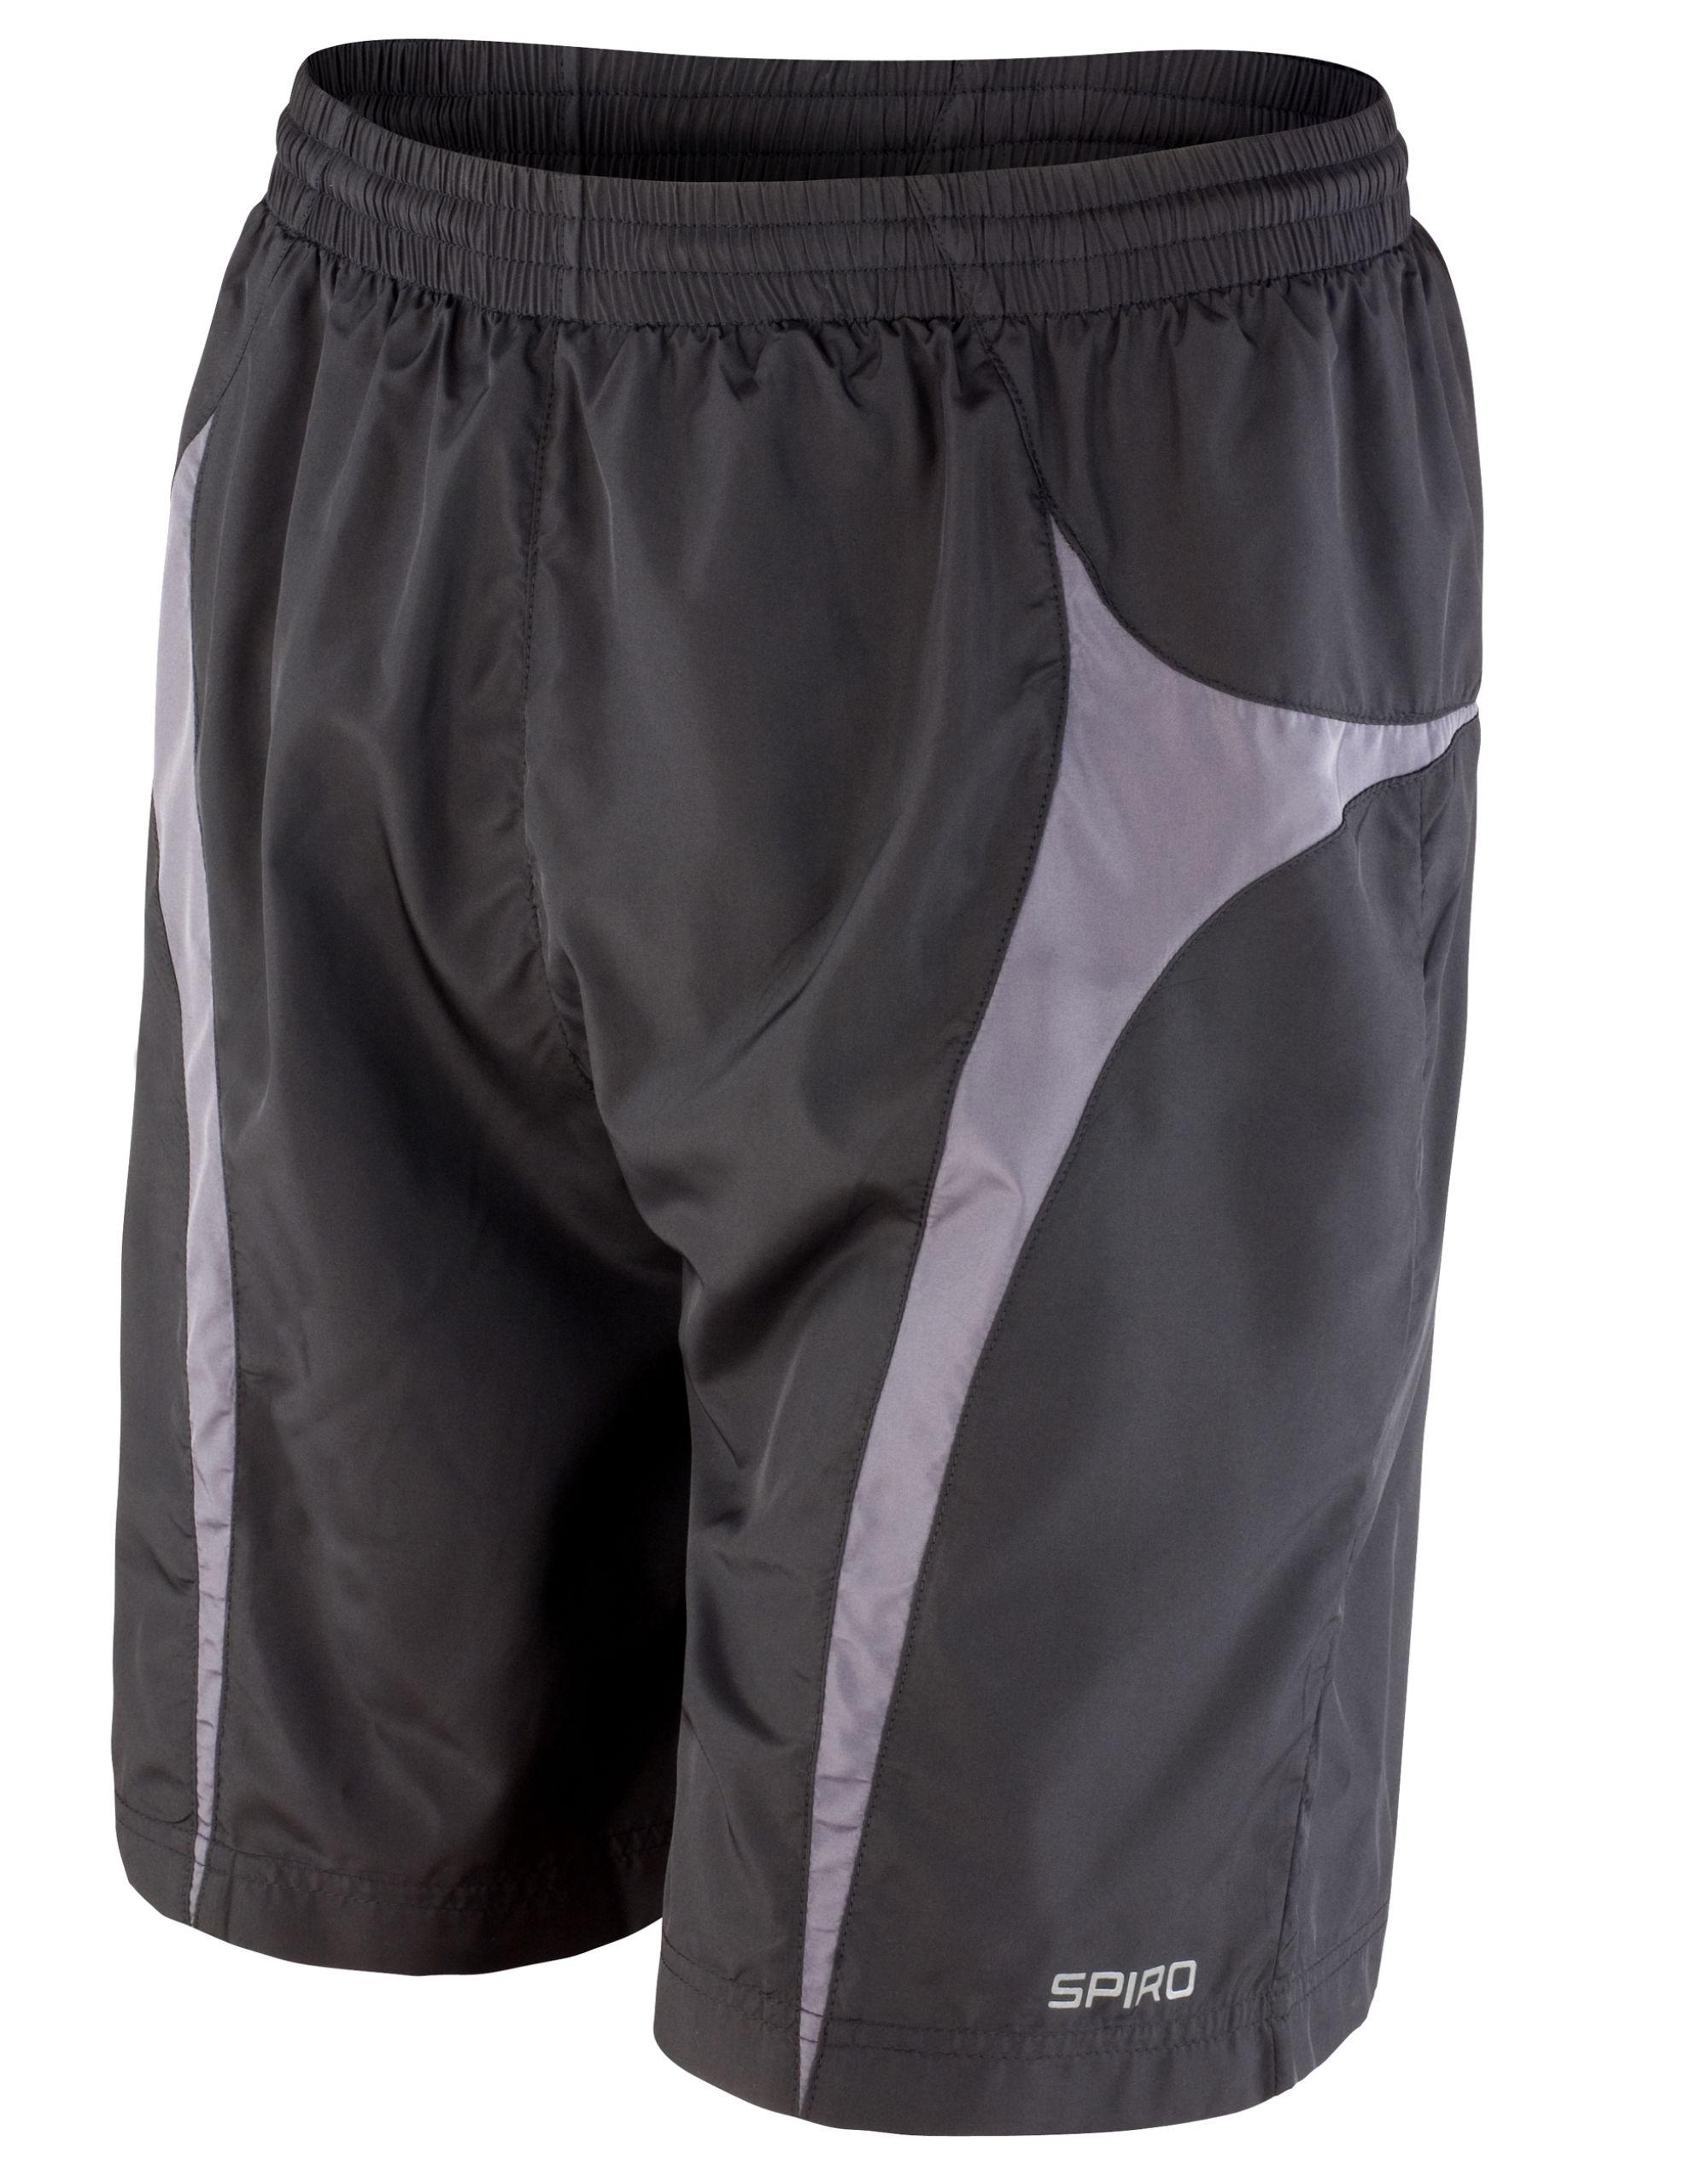 Spiro Unisex Micro-lite Team Shorts